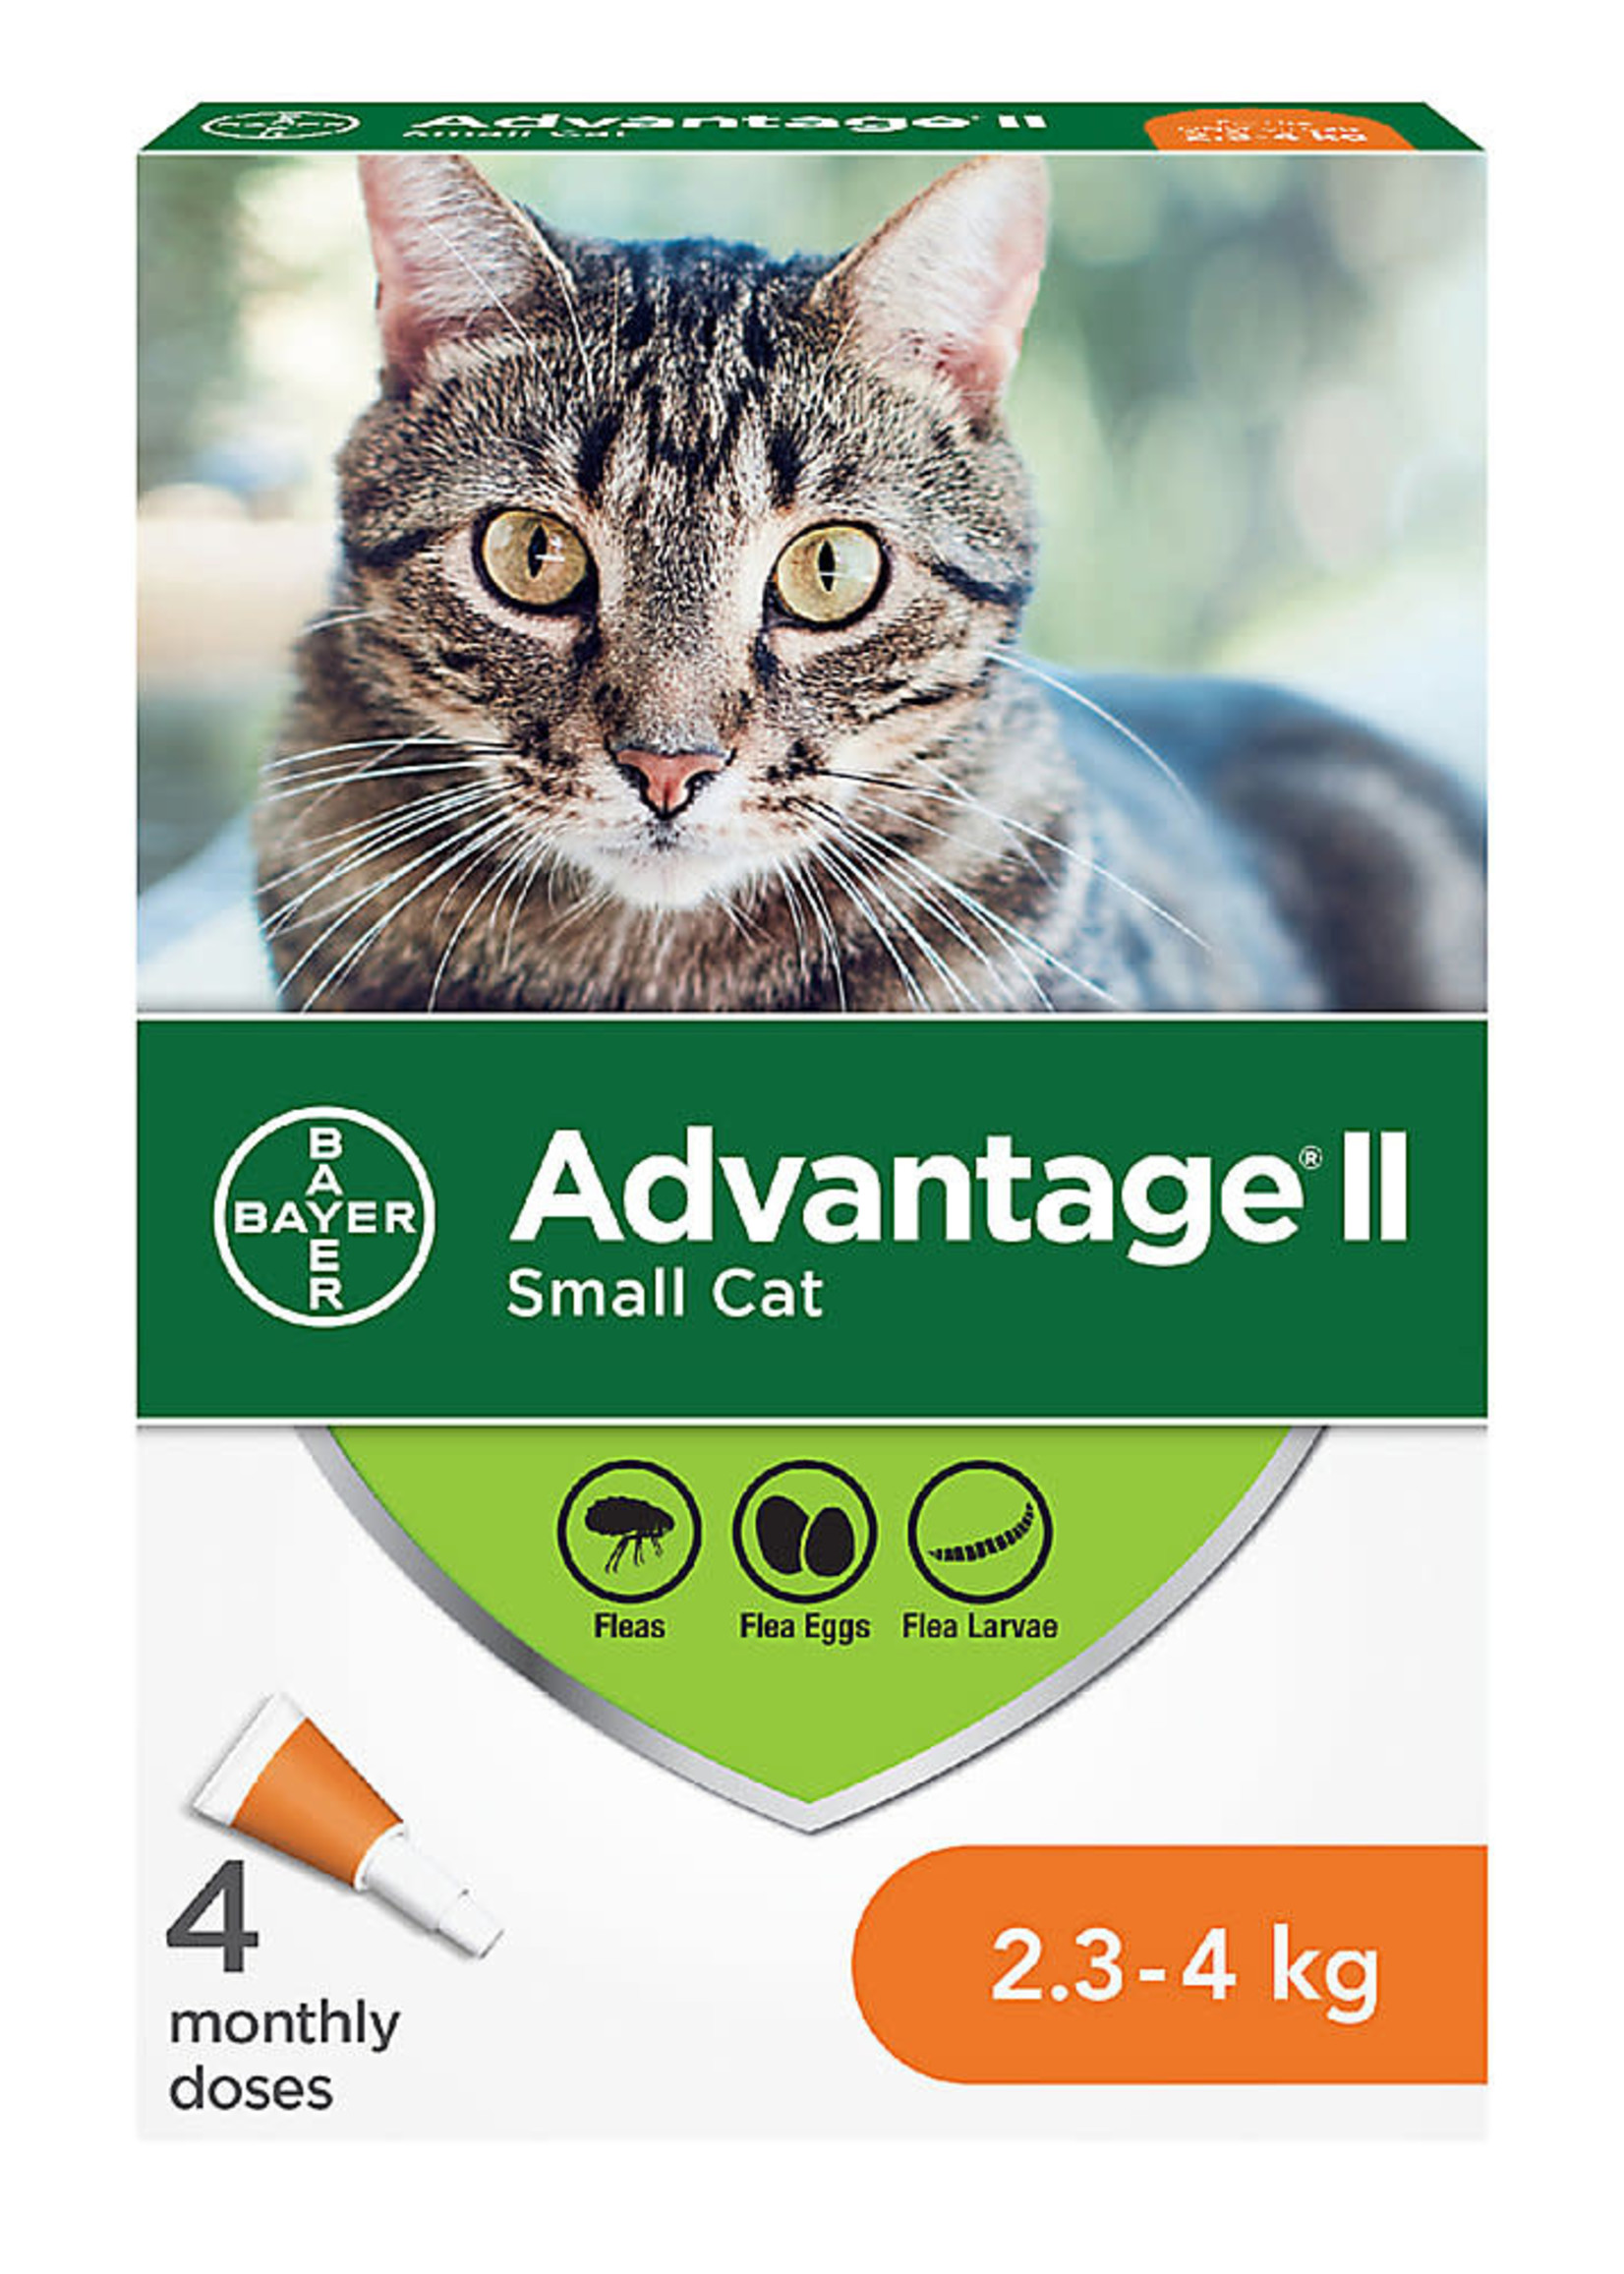 Bayer Advantage® II - Small Cat